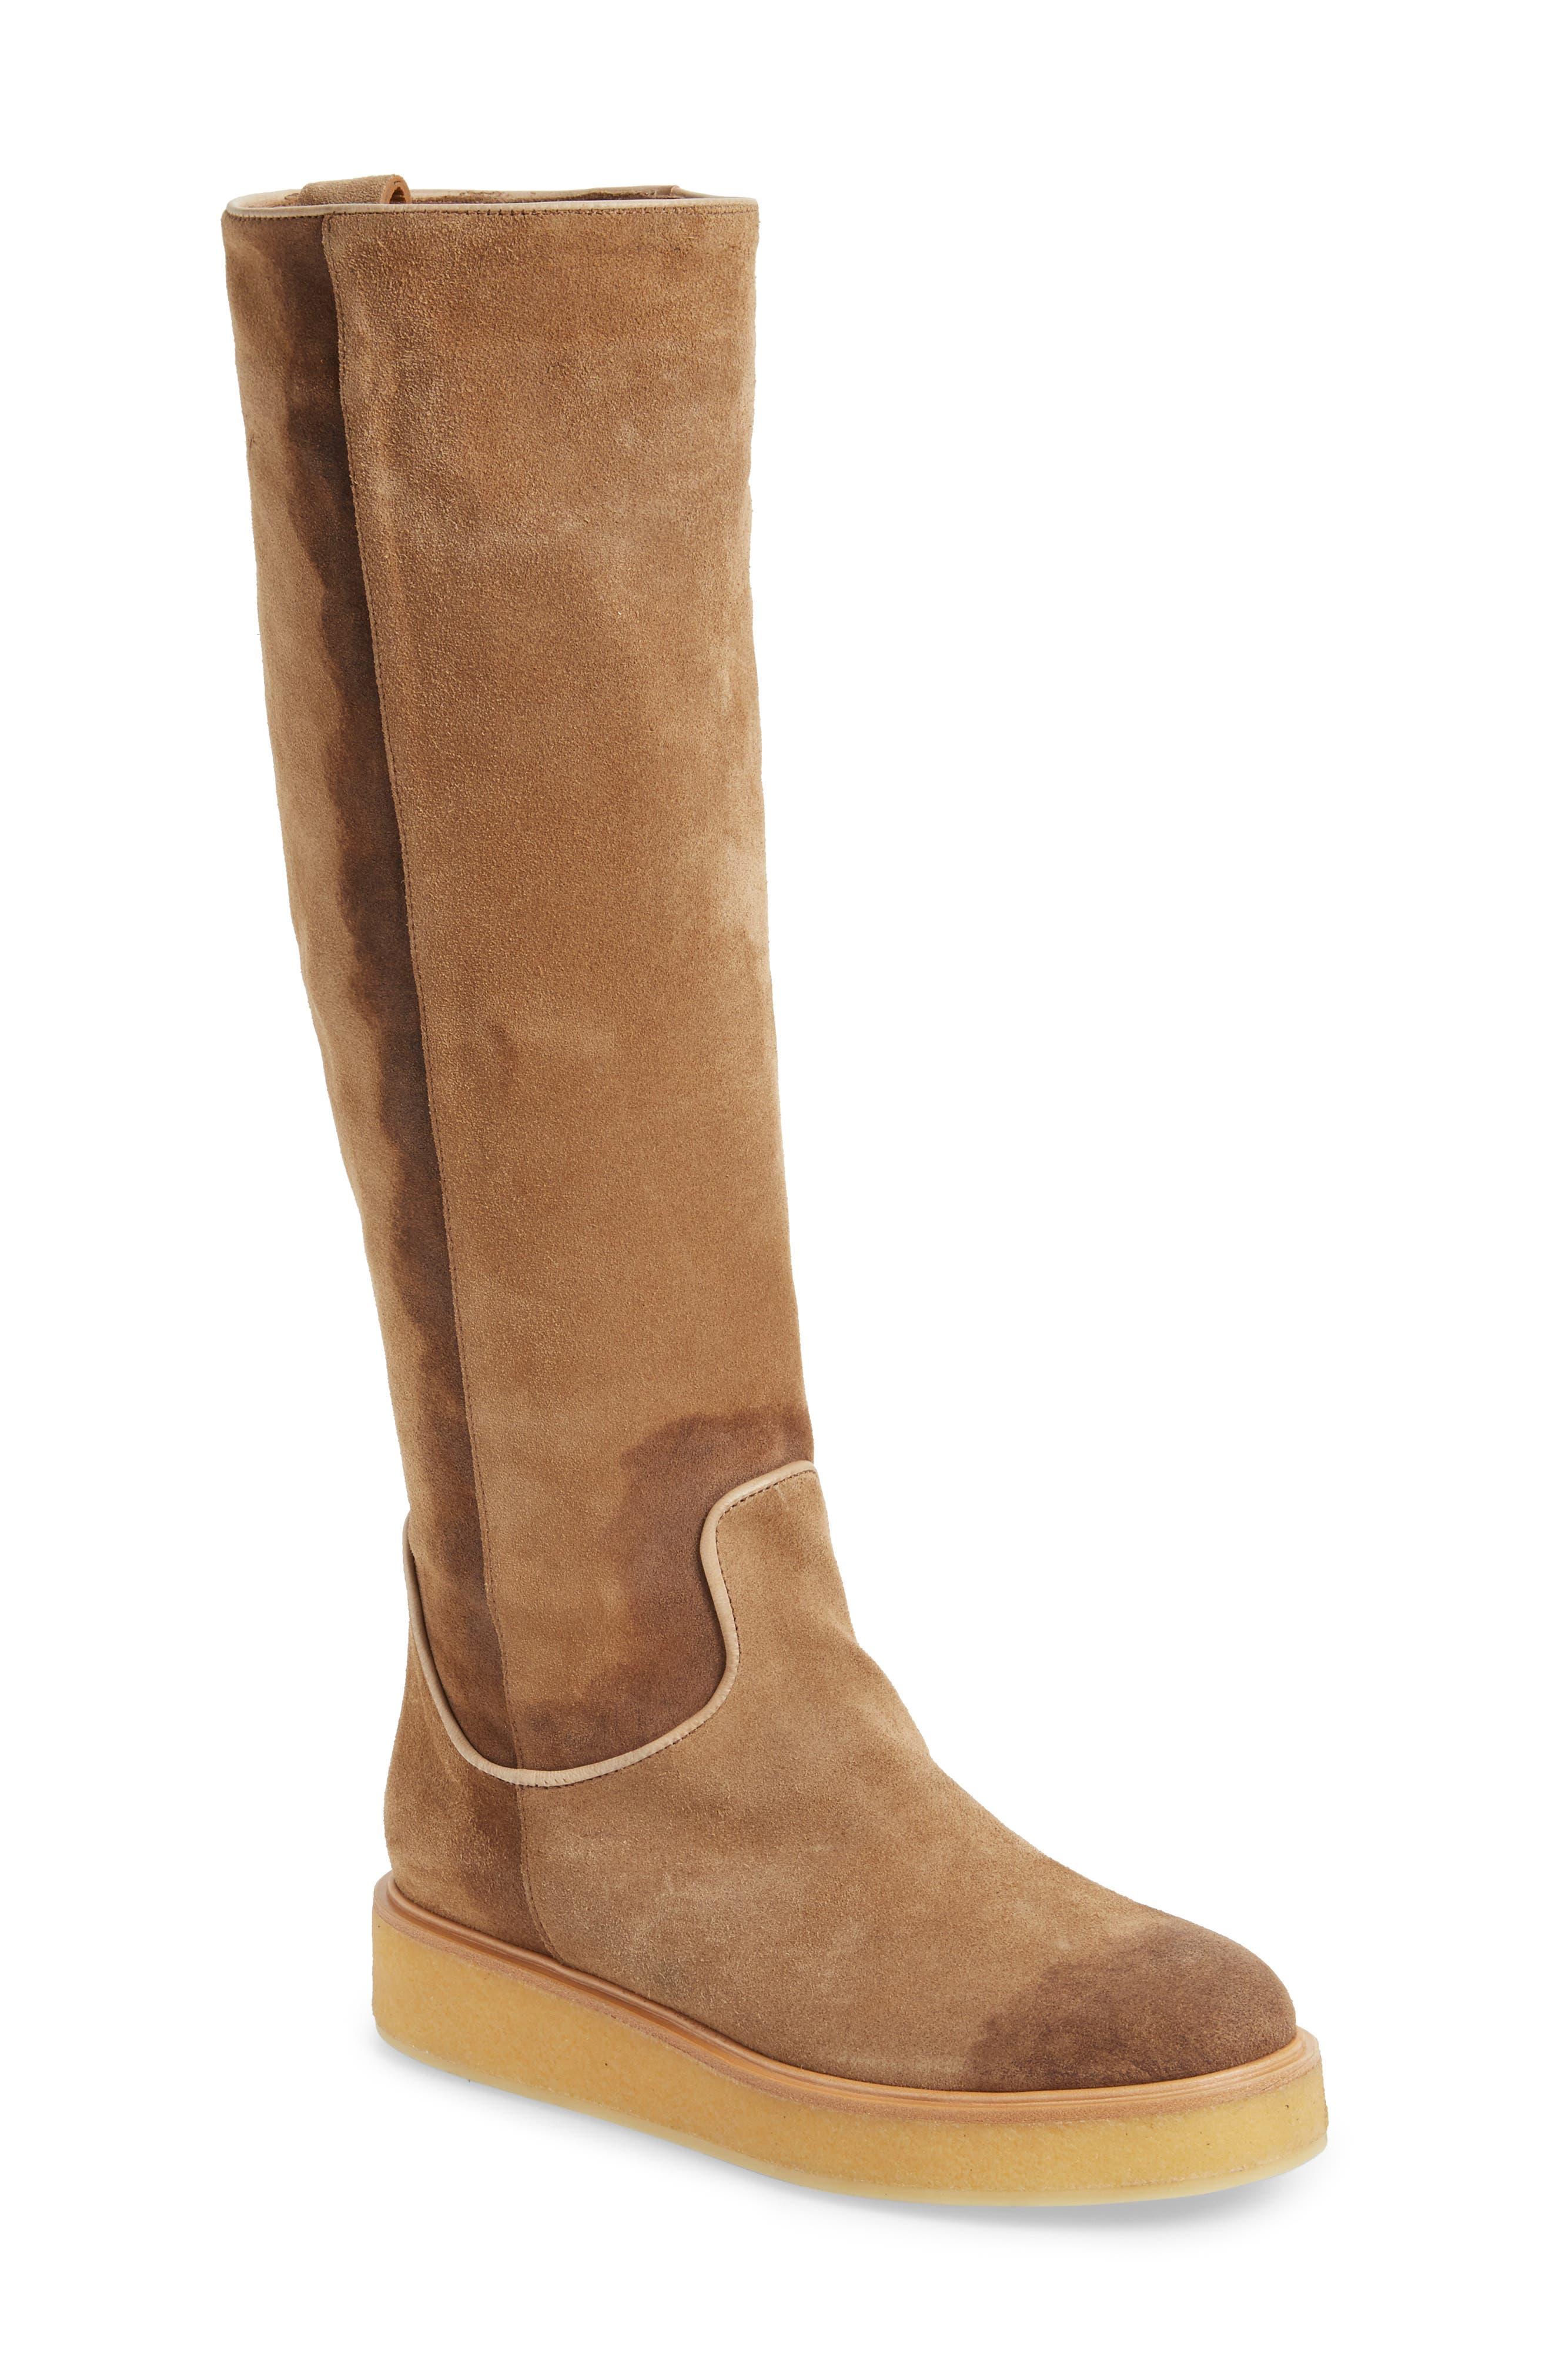 Nerola Knee High Boot,                         Main,                         color, Sahara